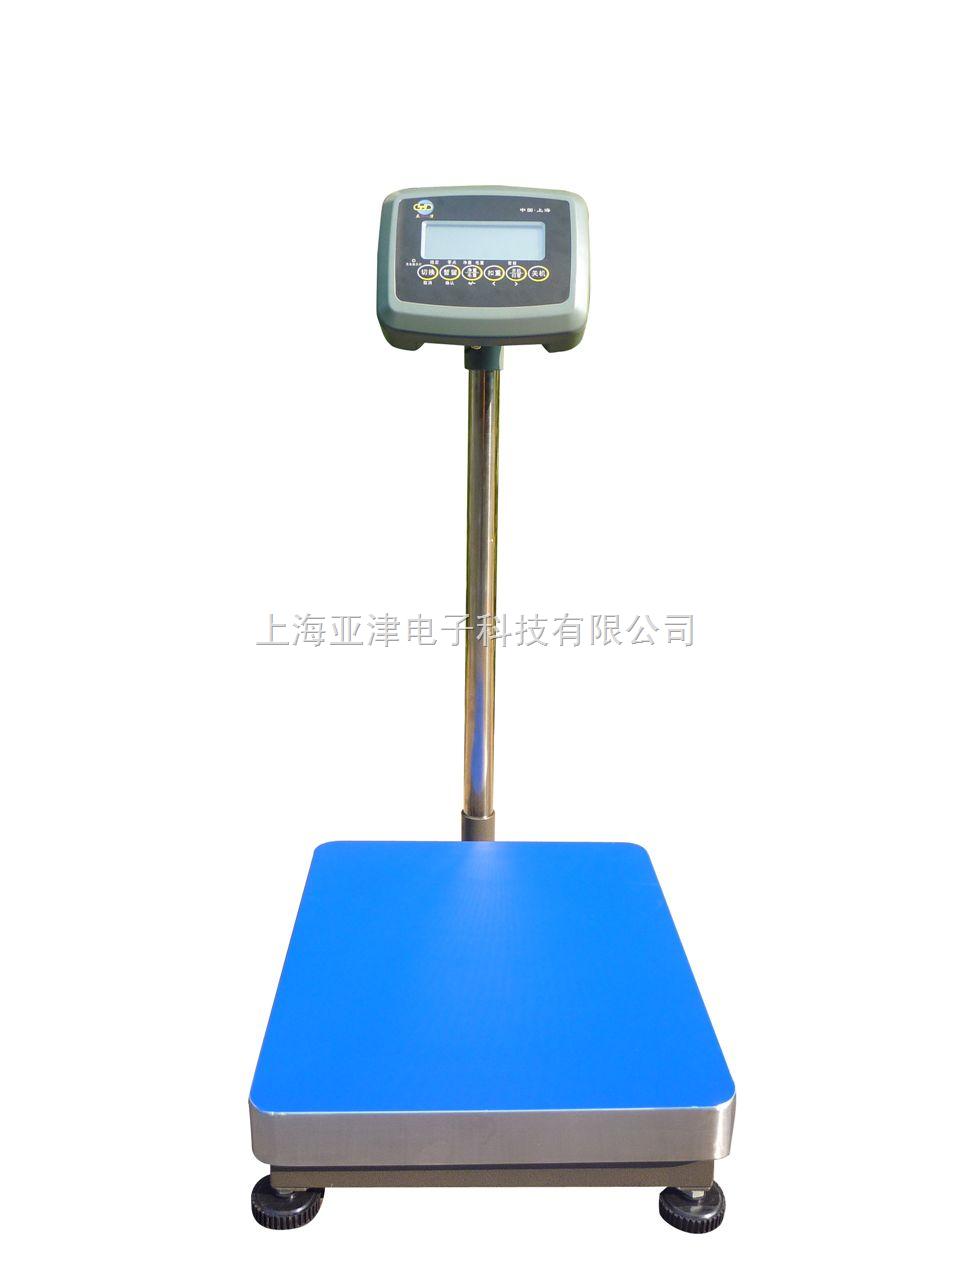 TCS上海杨浦100公斤10克电子称,电子台称说明书